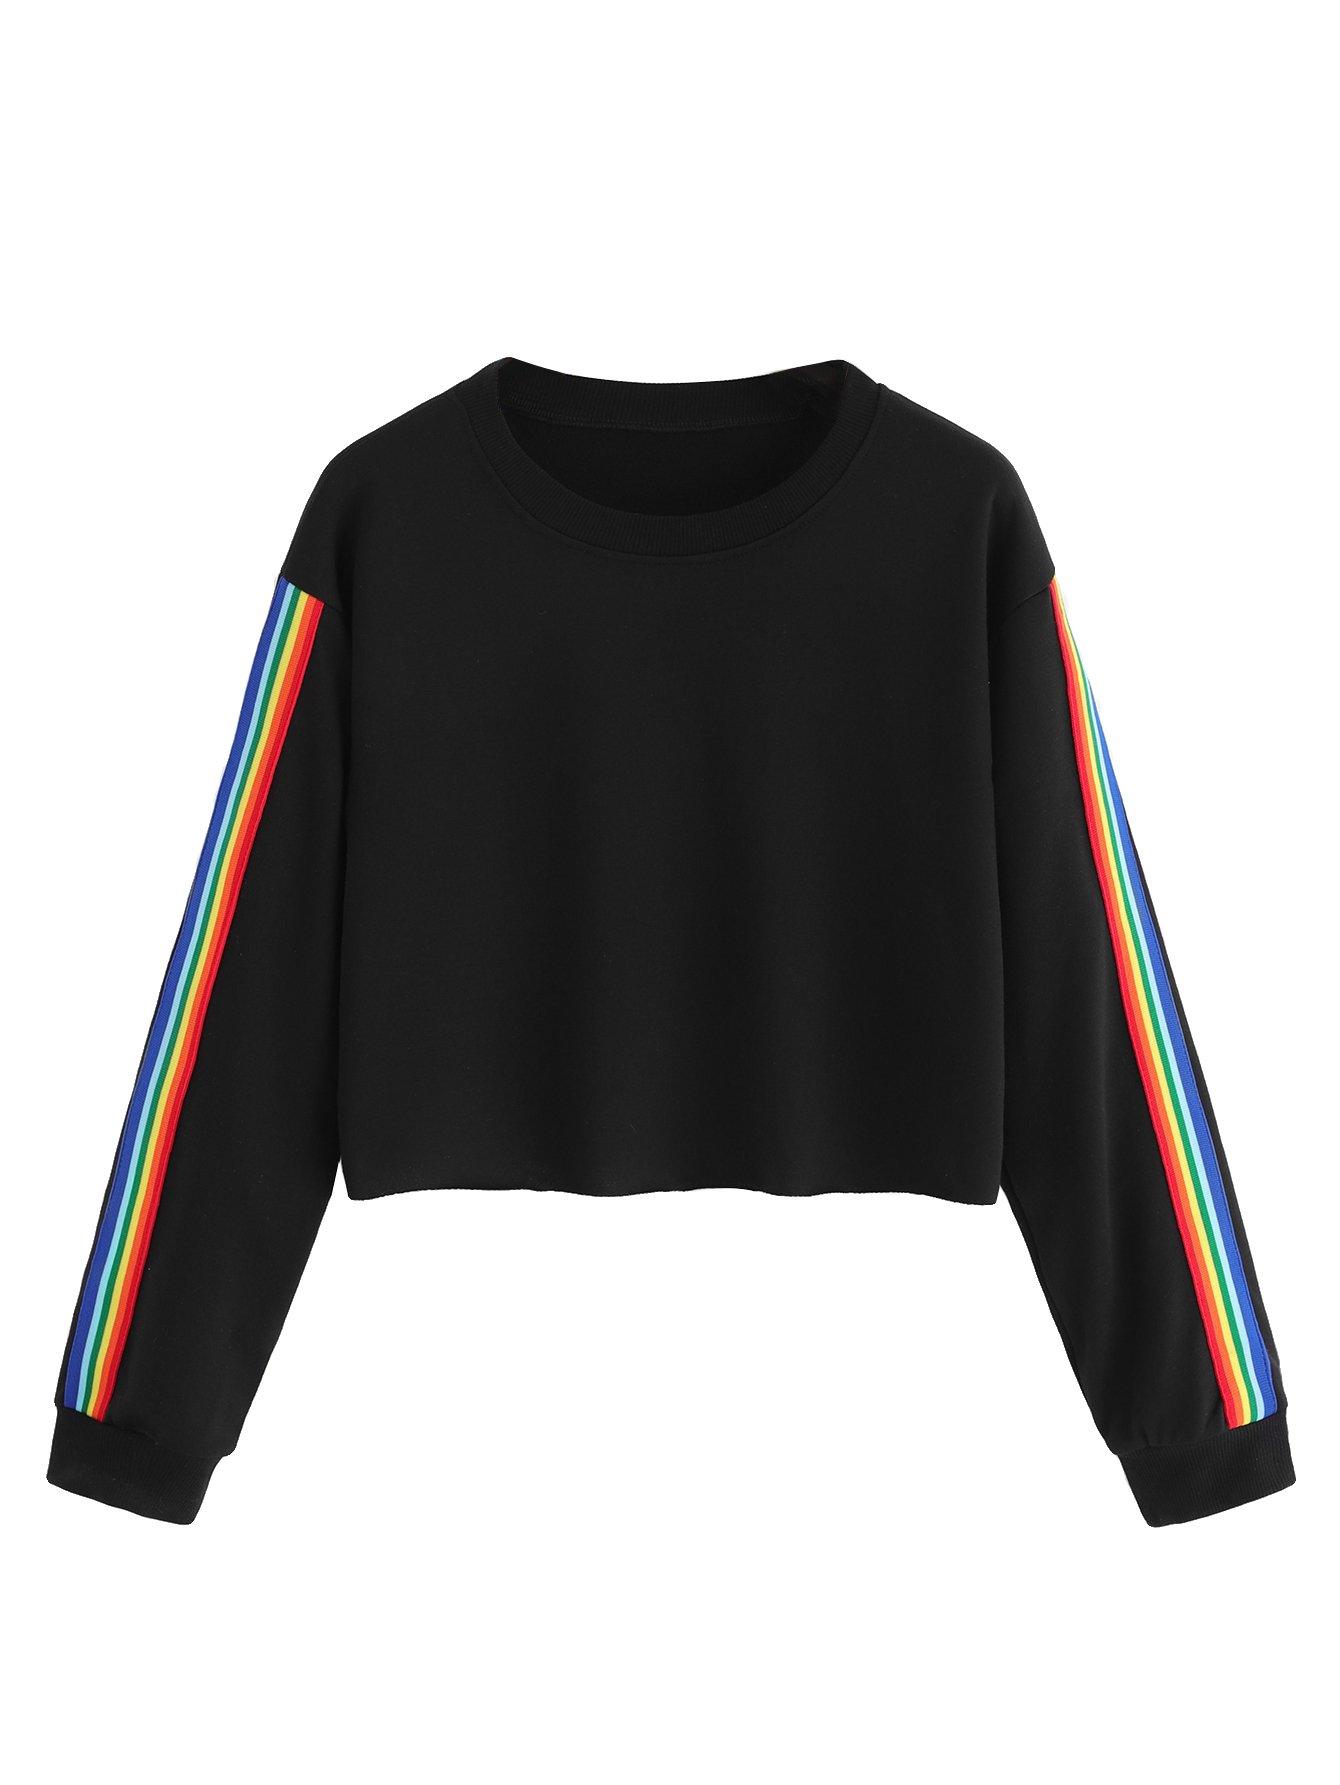 MakeMeChic Women's Rainbow Color Block Striped Crop Top Sweatshirt Black L